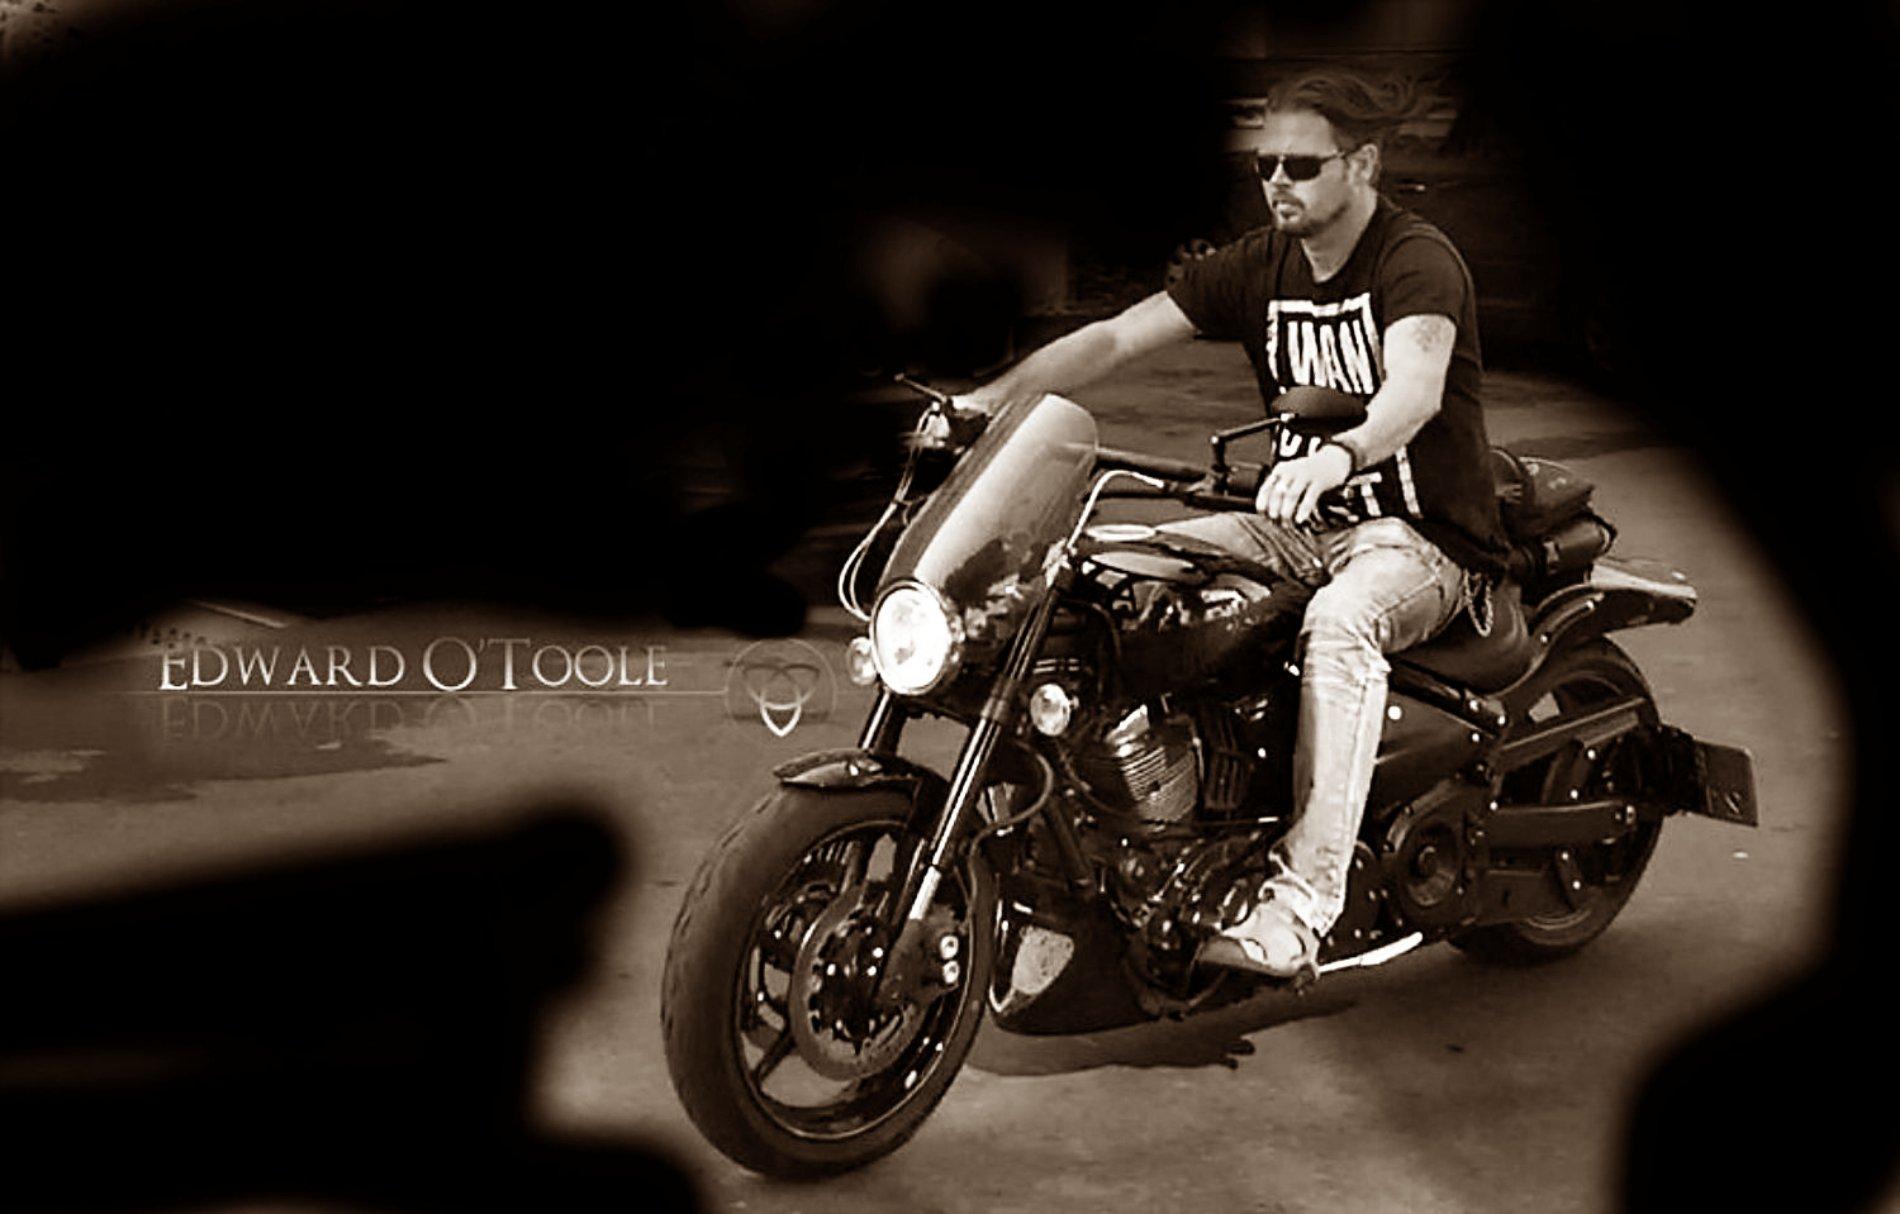 oldschoolbikeredwardotoole